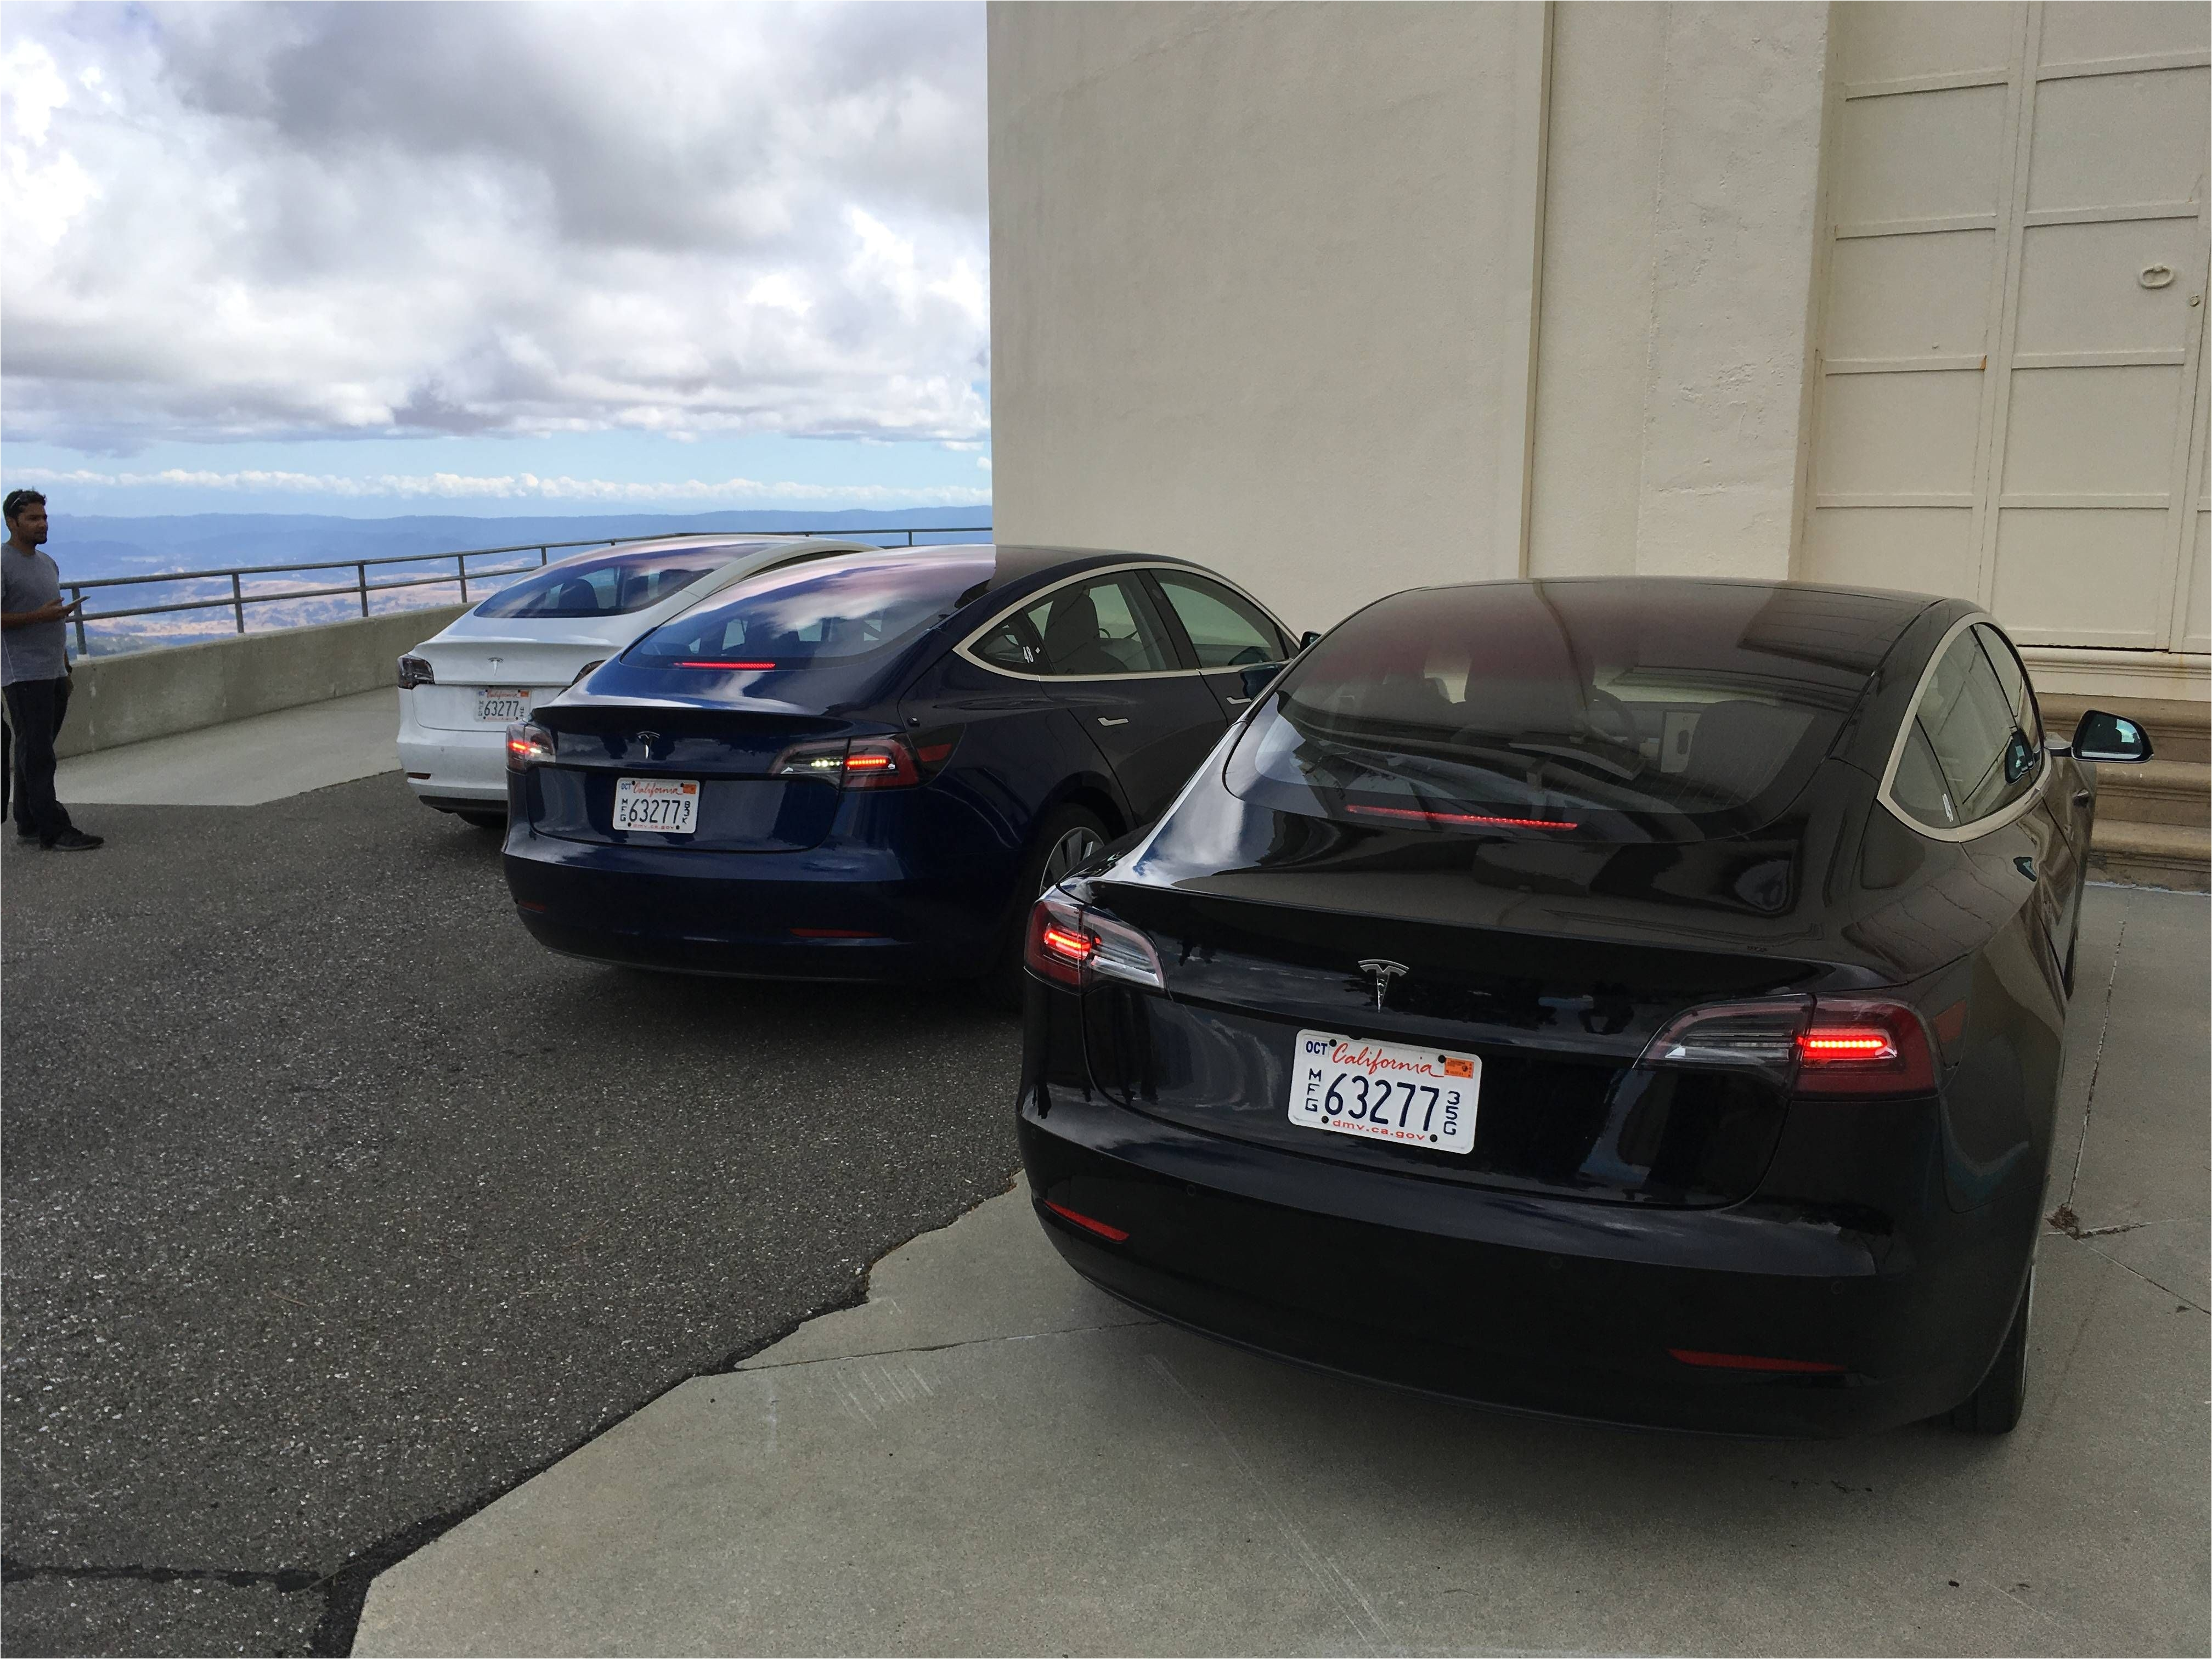 Tesla Roof Rack Model X Tesla Model 3 Model 3 Pinterest Cars